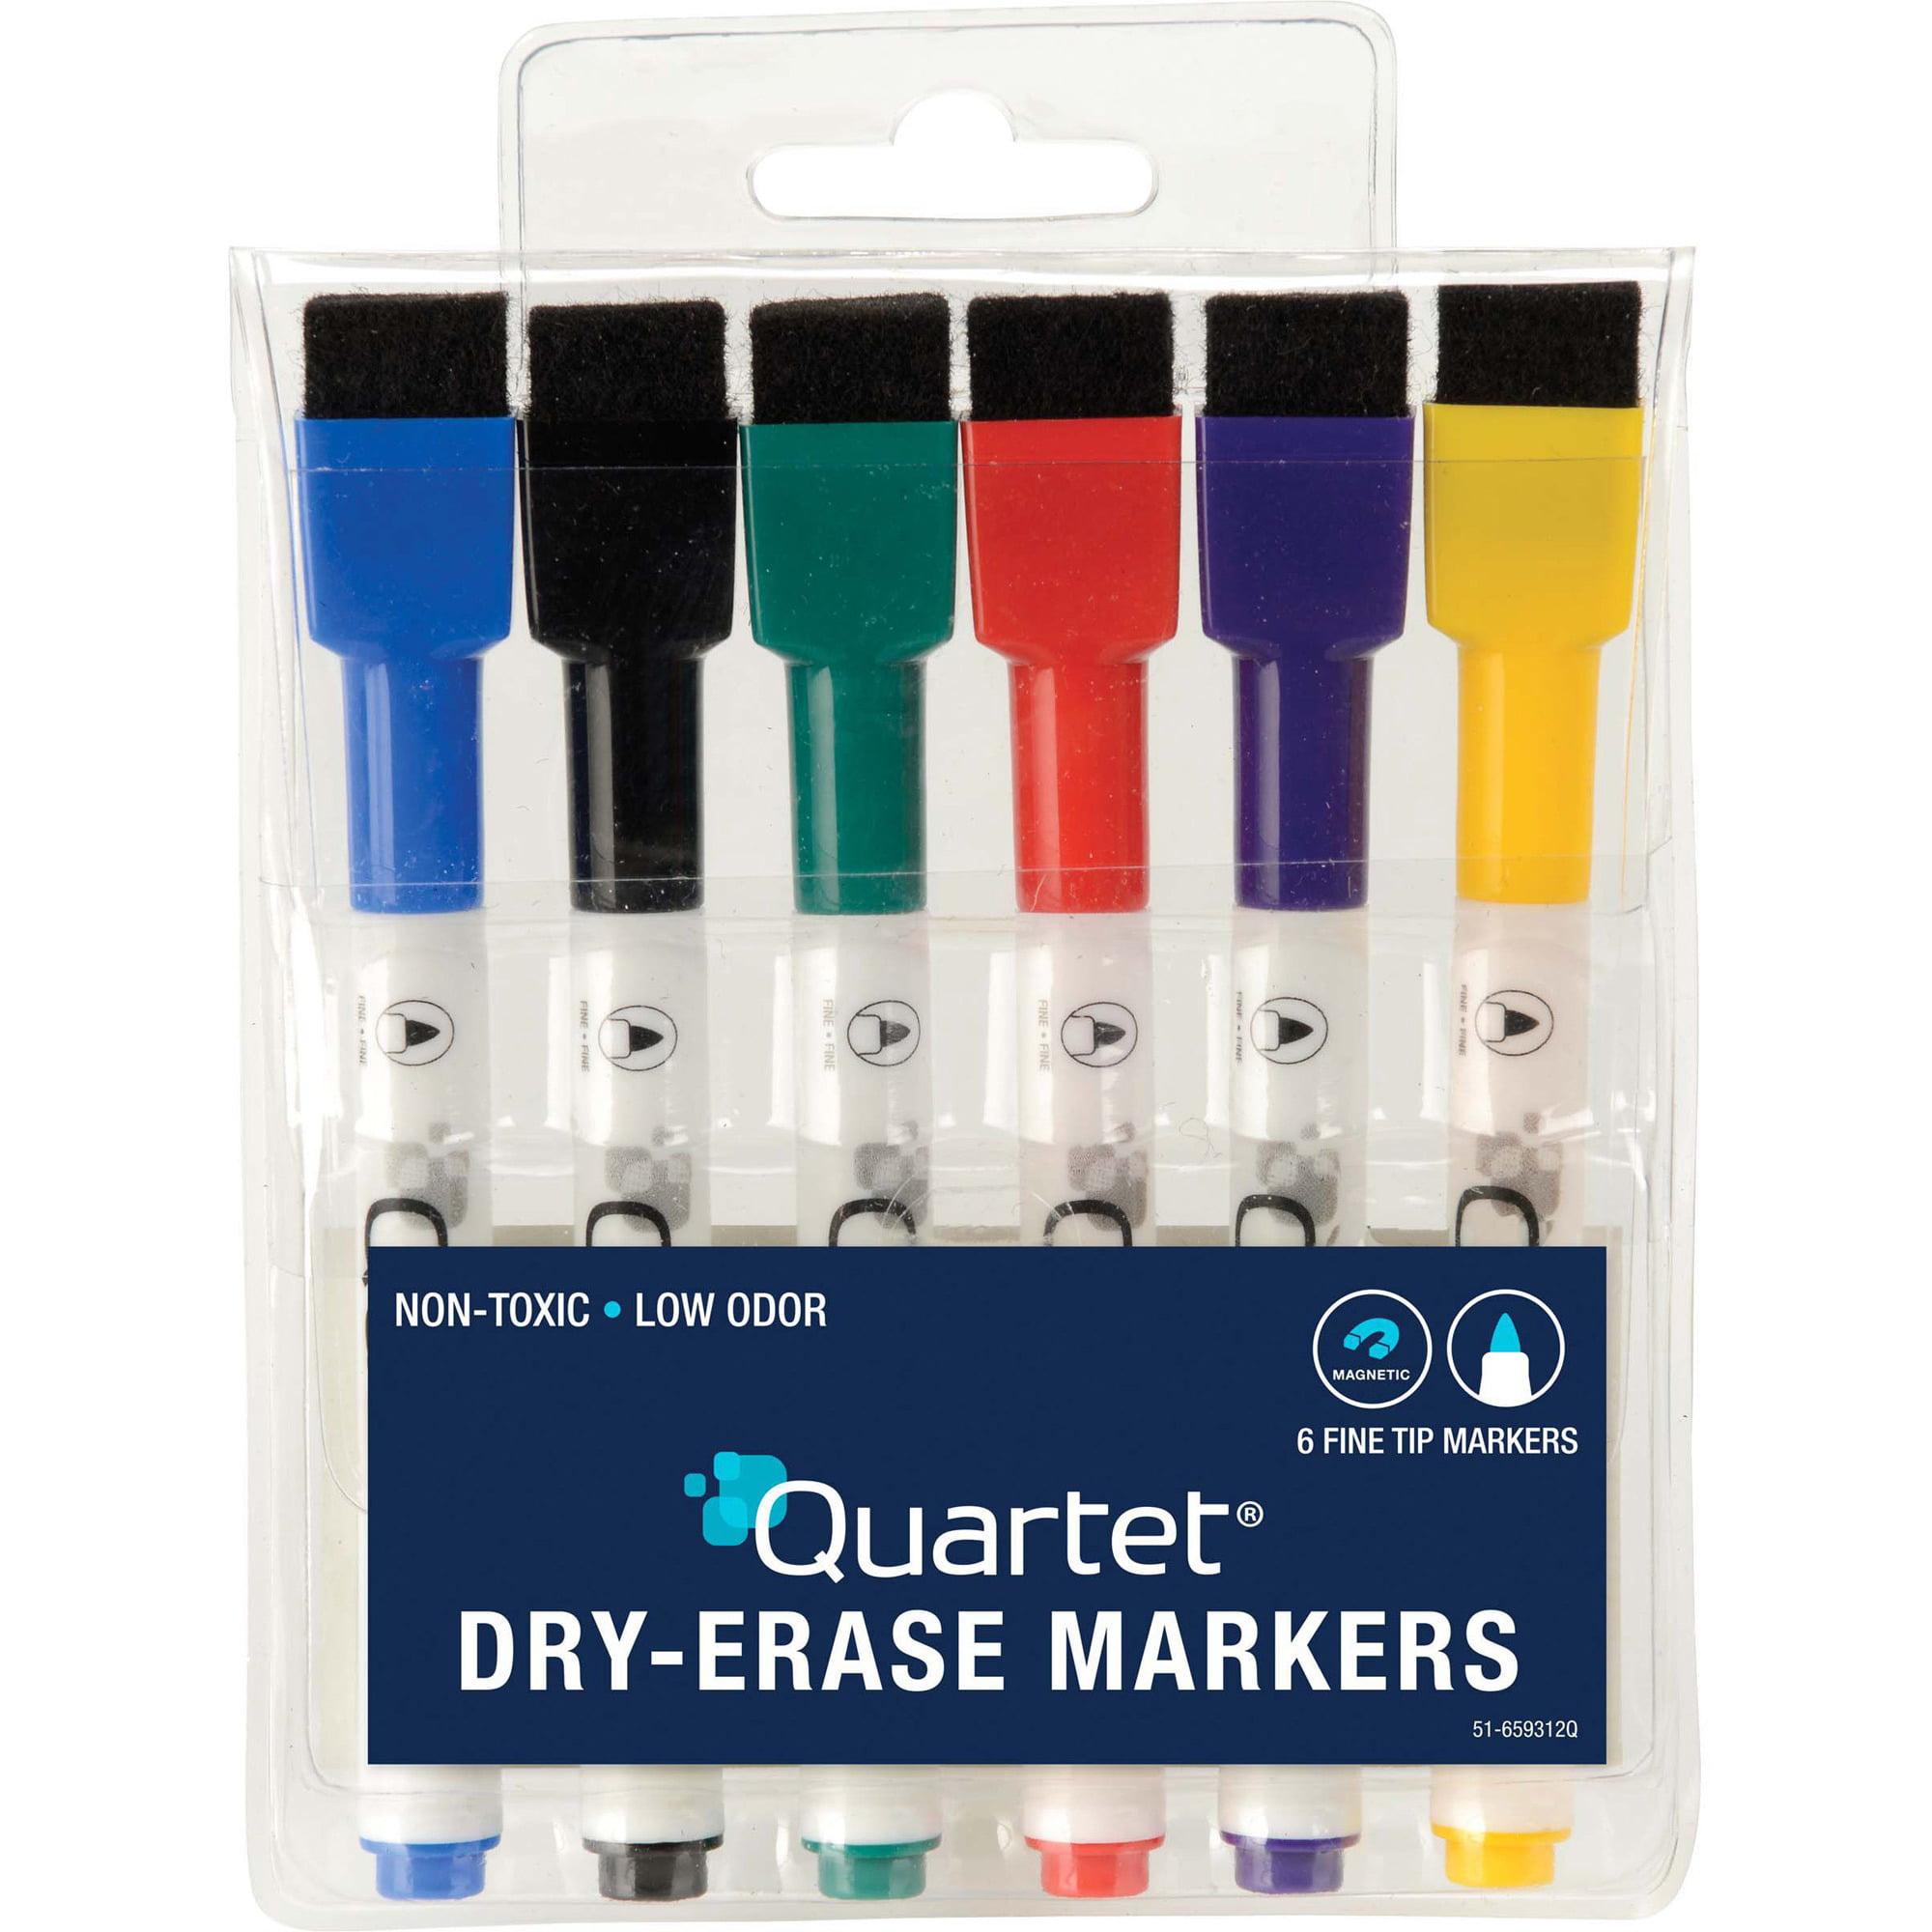 Quartet ReWritables Mini Dry-Erase Markers, Magnetic, Assorted Classic Colors, 6 Pack (51-659312Q)